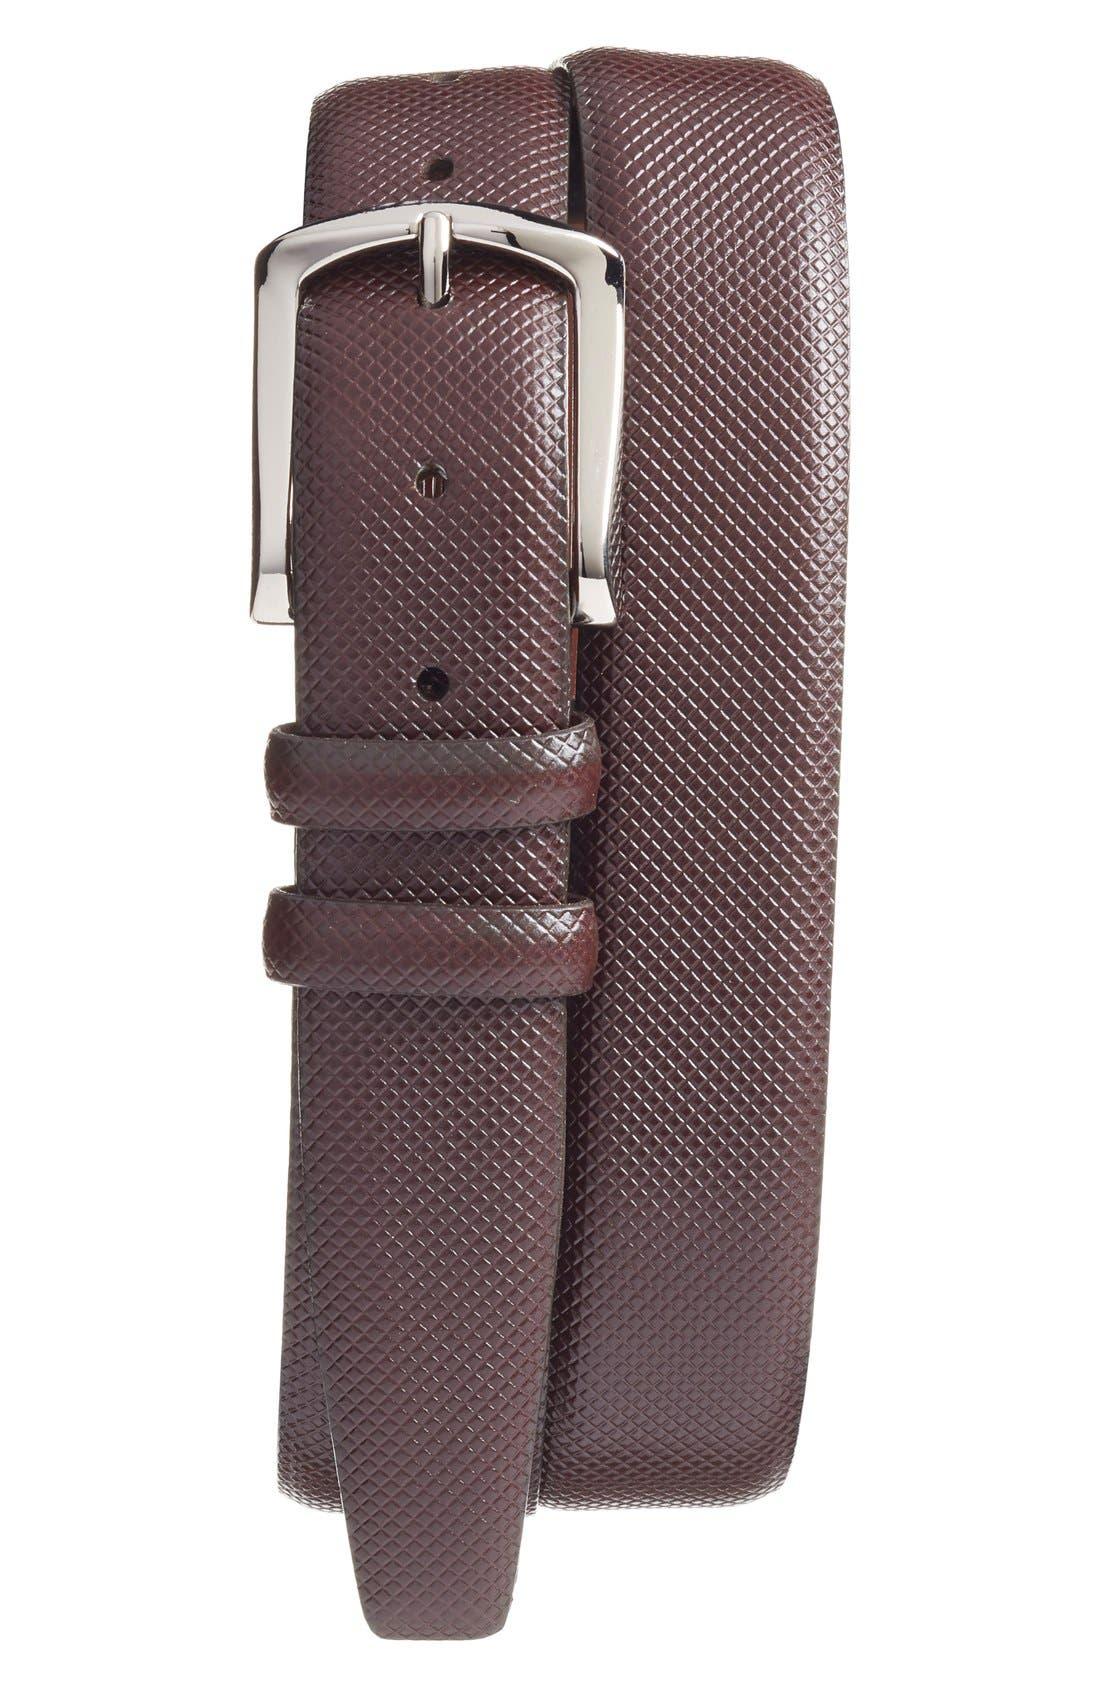 Main Image - Torino Belts Bulgaro Calfskin Leather Belt